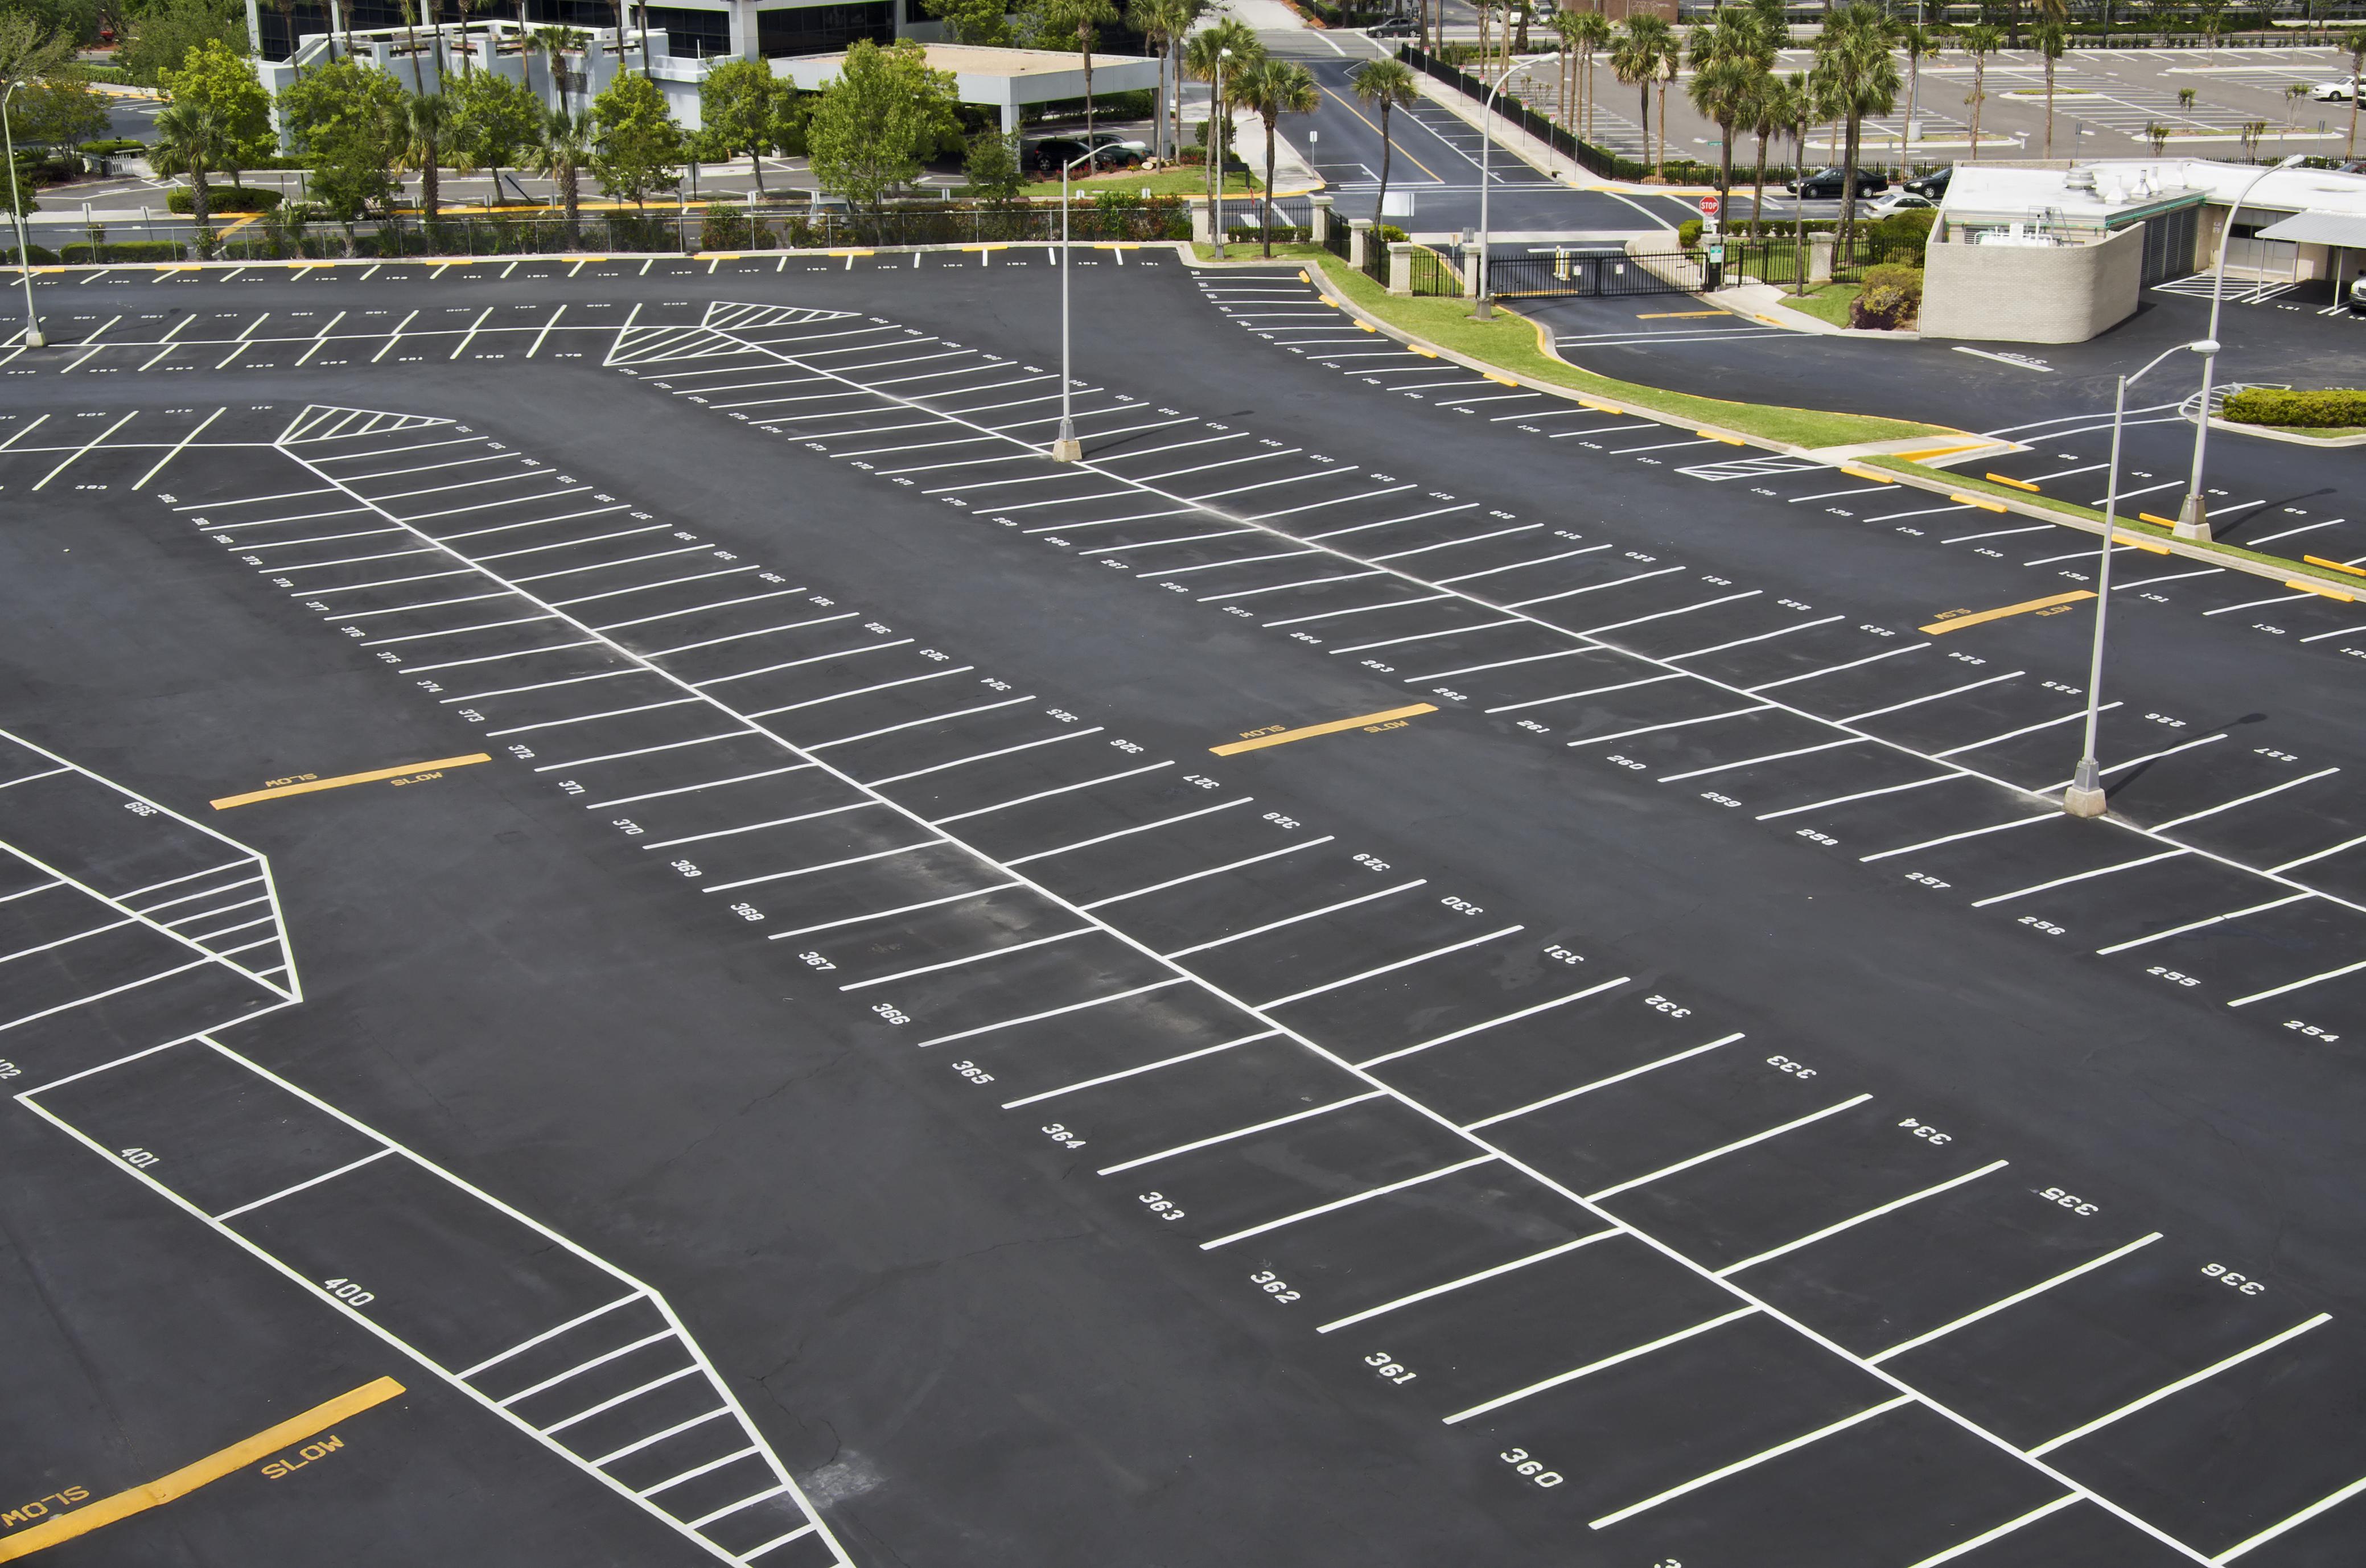 Parking lot clipart parking garage. Free cliparts download clip